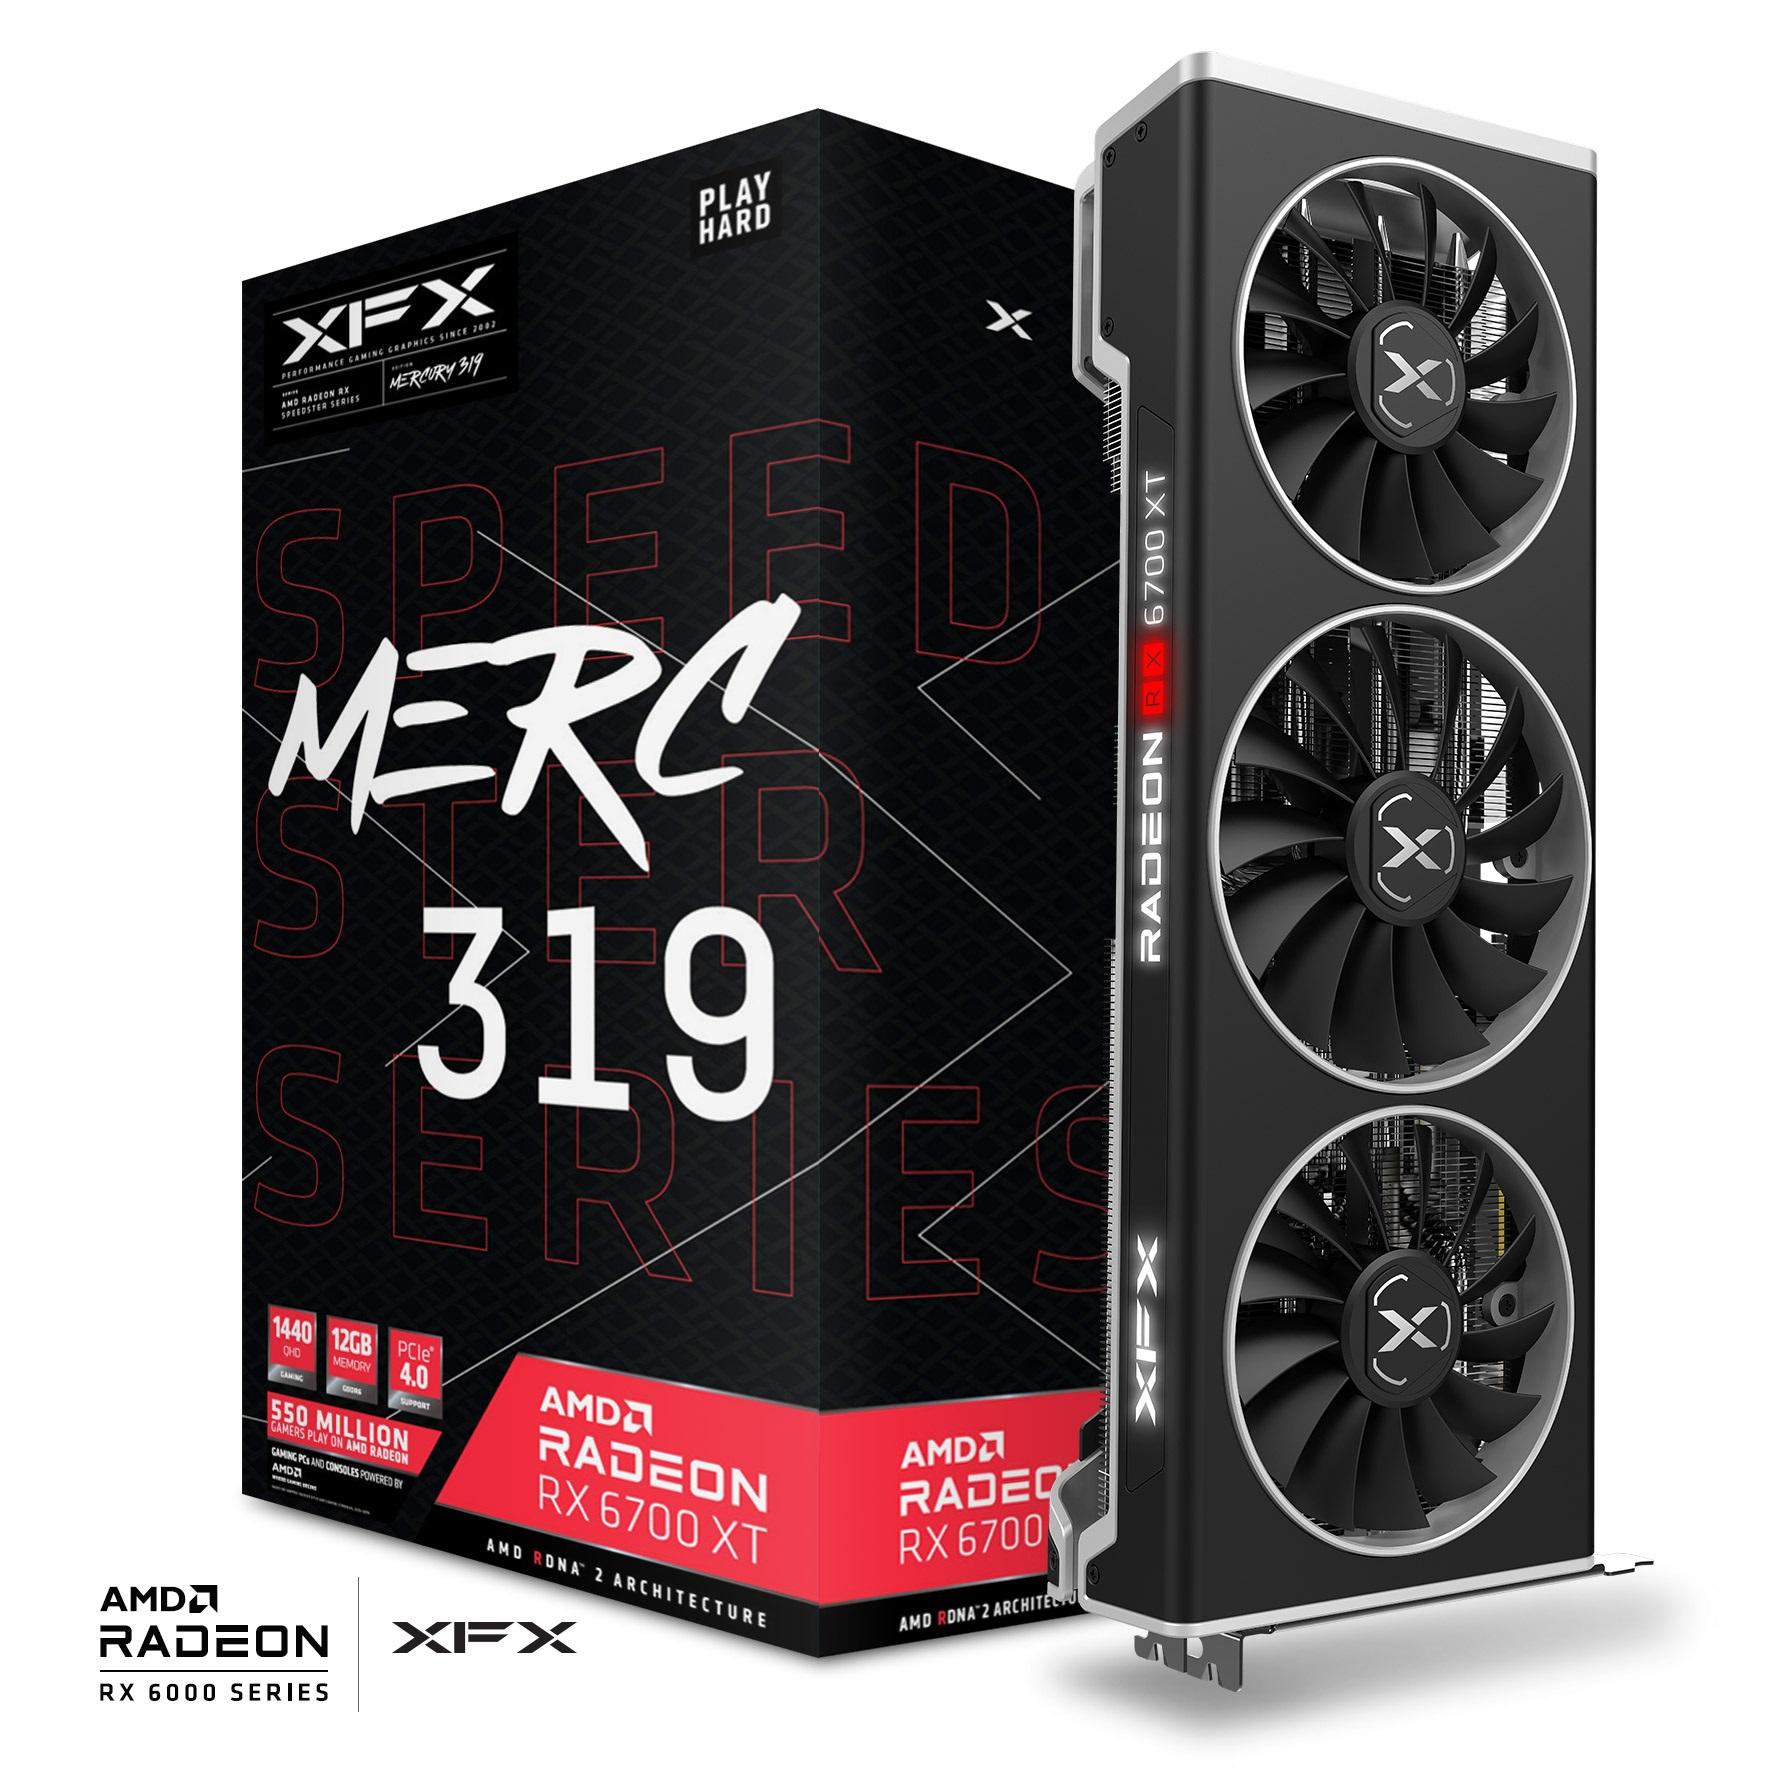 XFX RX-67XTYTBDP RX6700XT MERC319 / BLACK 12GB GDDR6 192Bit 3xDP/1xHDMI PCI-E 4.0